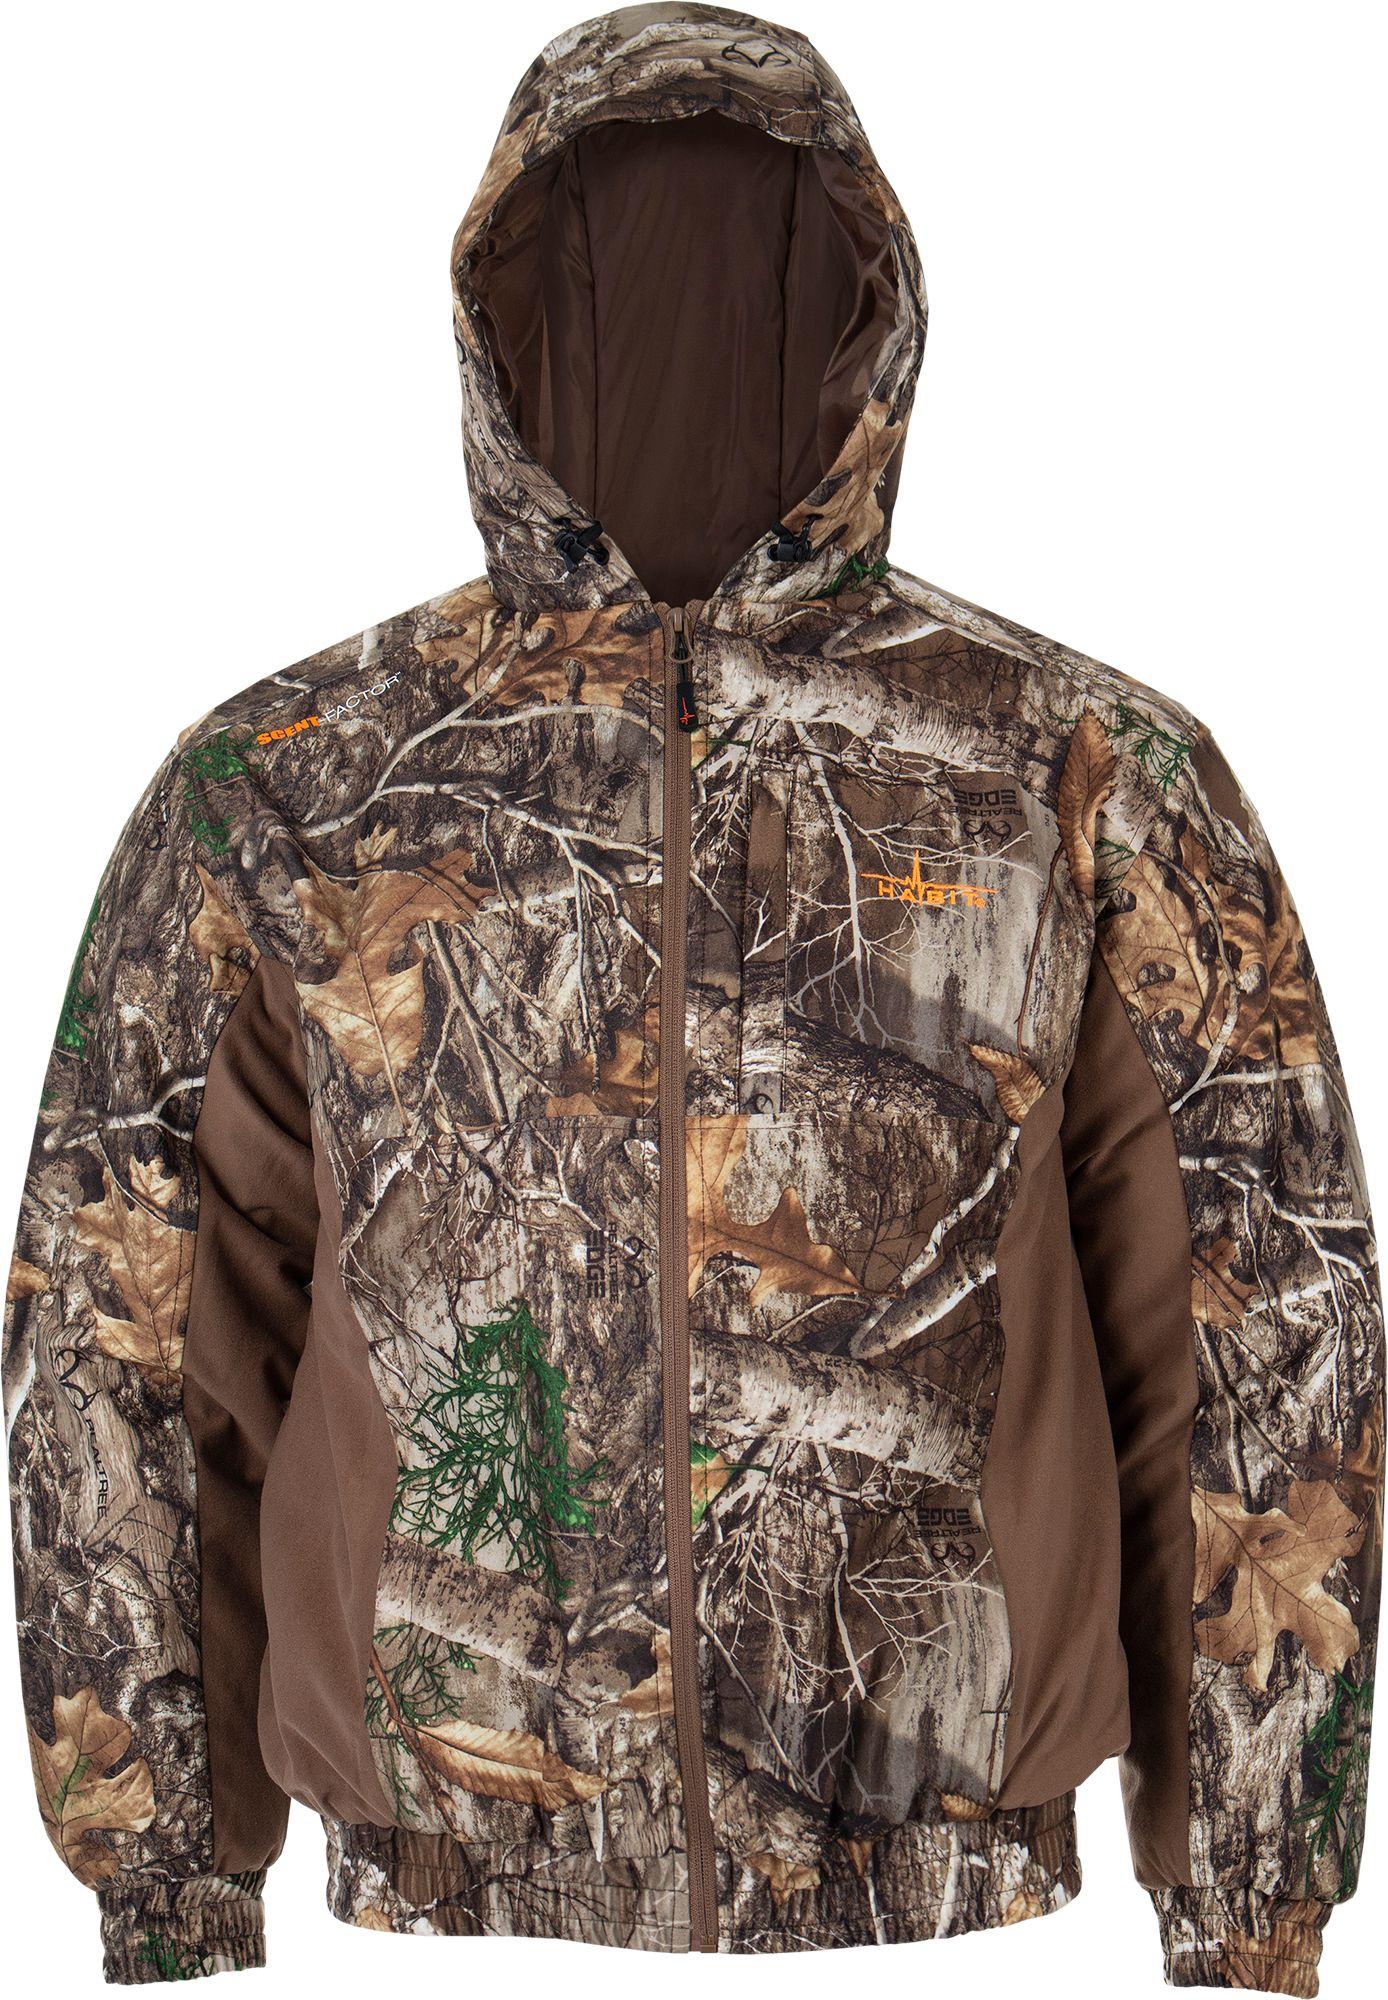 Habit Men's Cedar Branch Insulated Waterproof Bomber Hunting Jacket, Medium, Multi